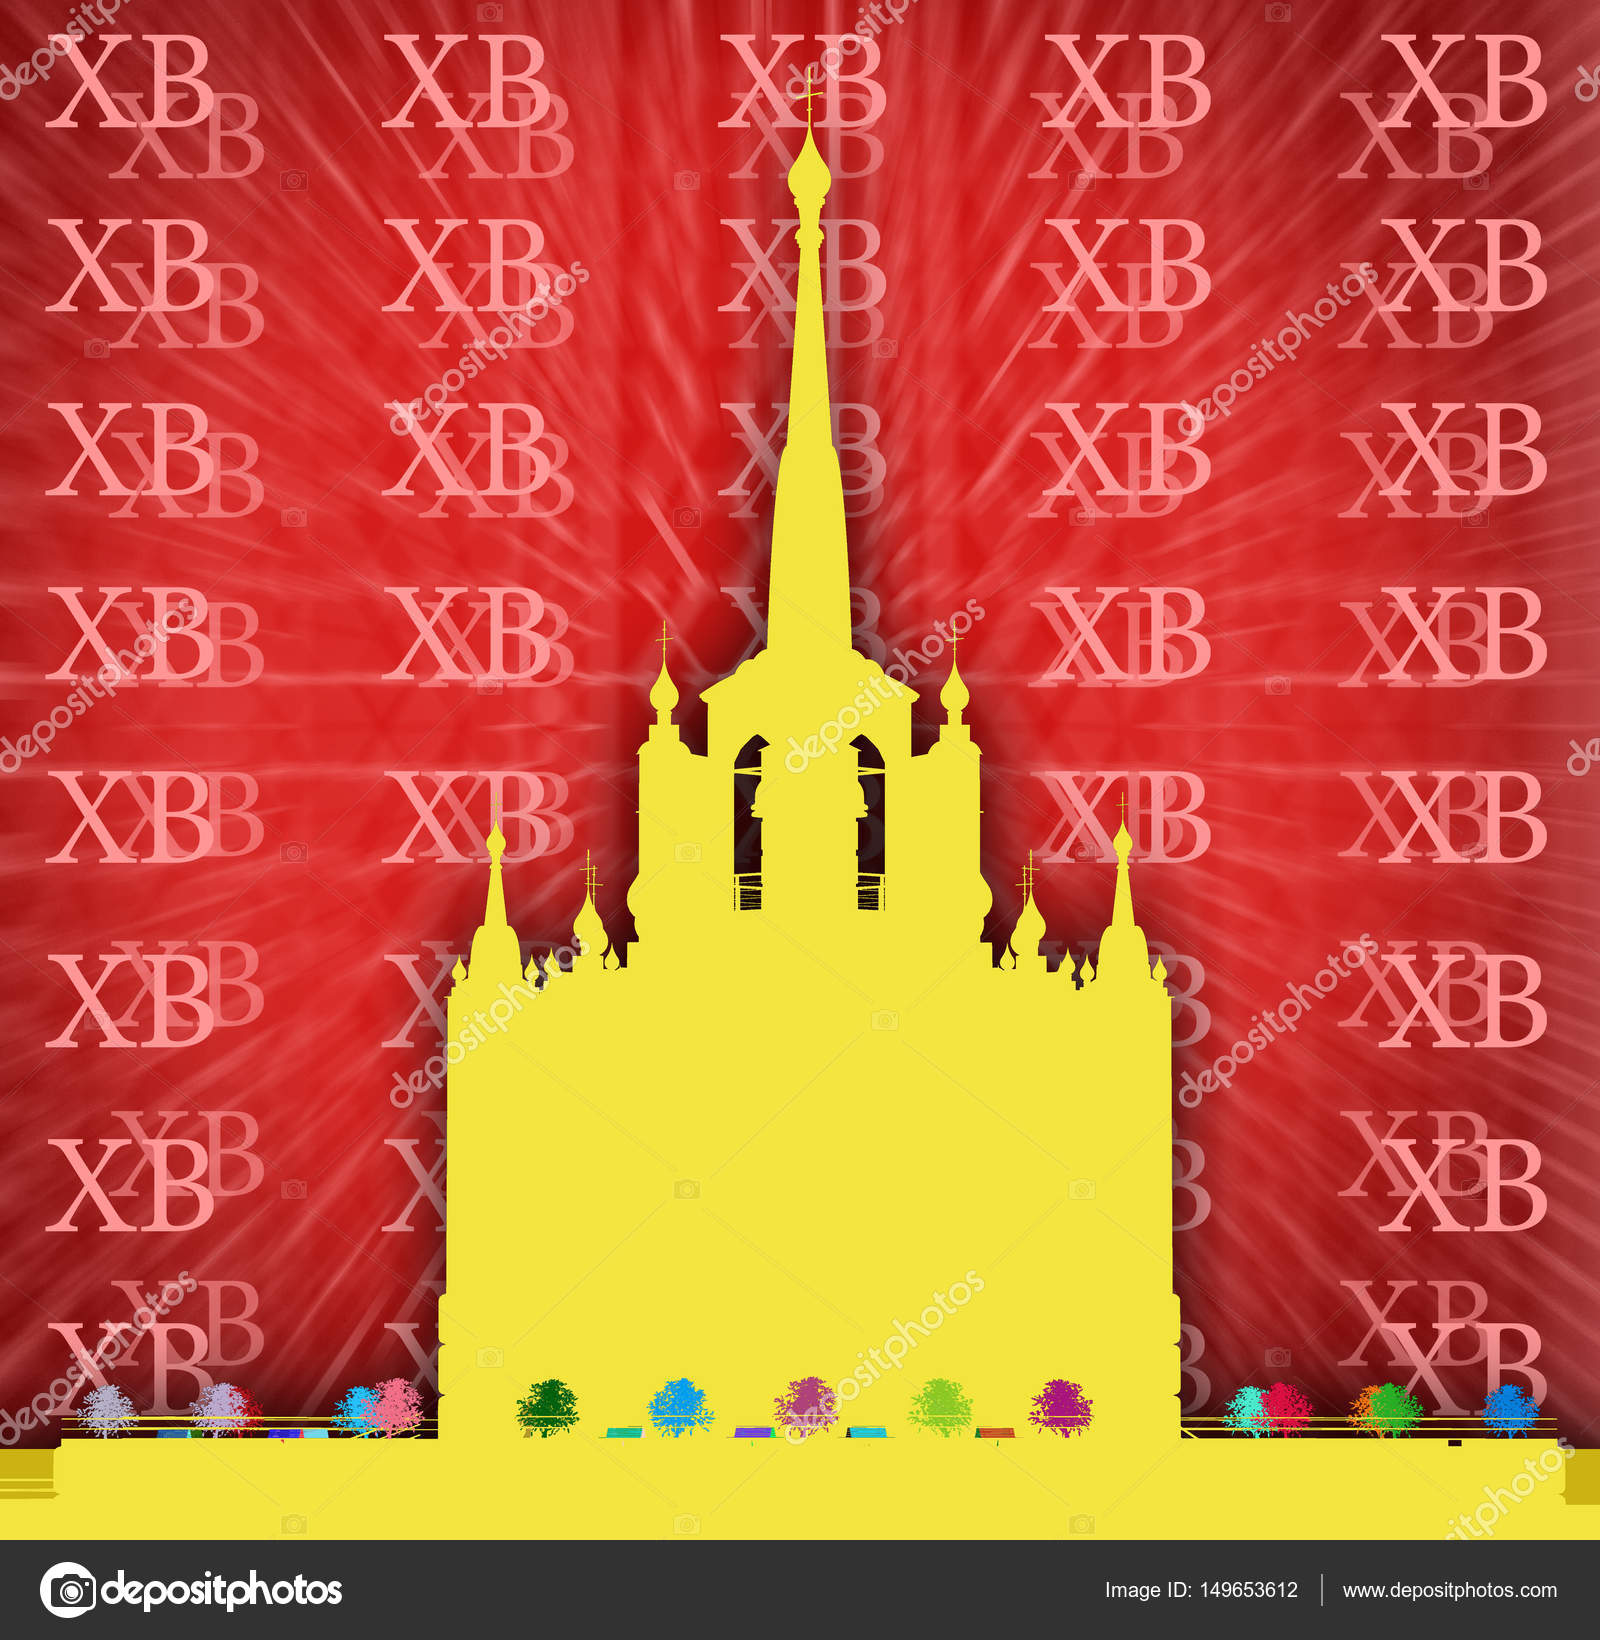 The Form Of Church Easter Greetings Stock Photo Wwaawwaa 149653612